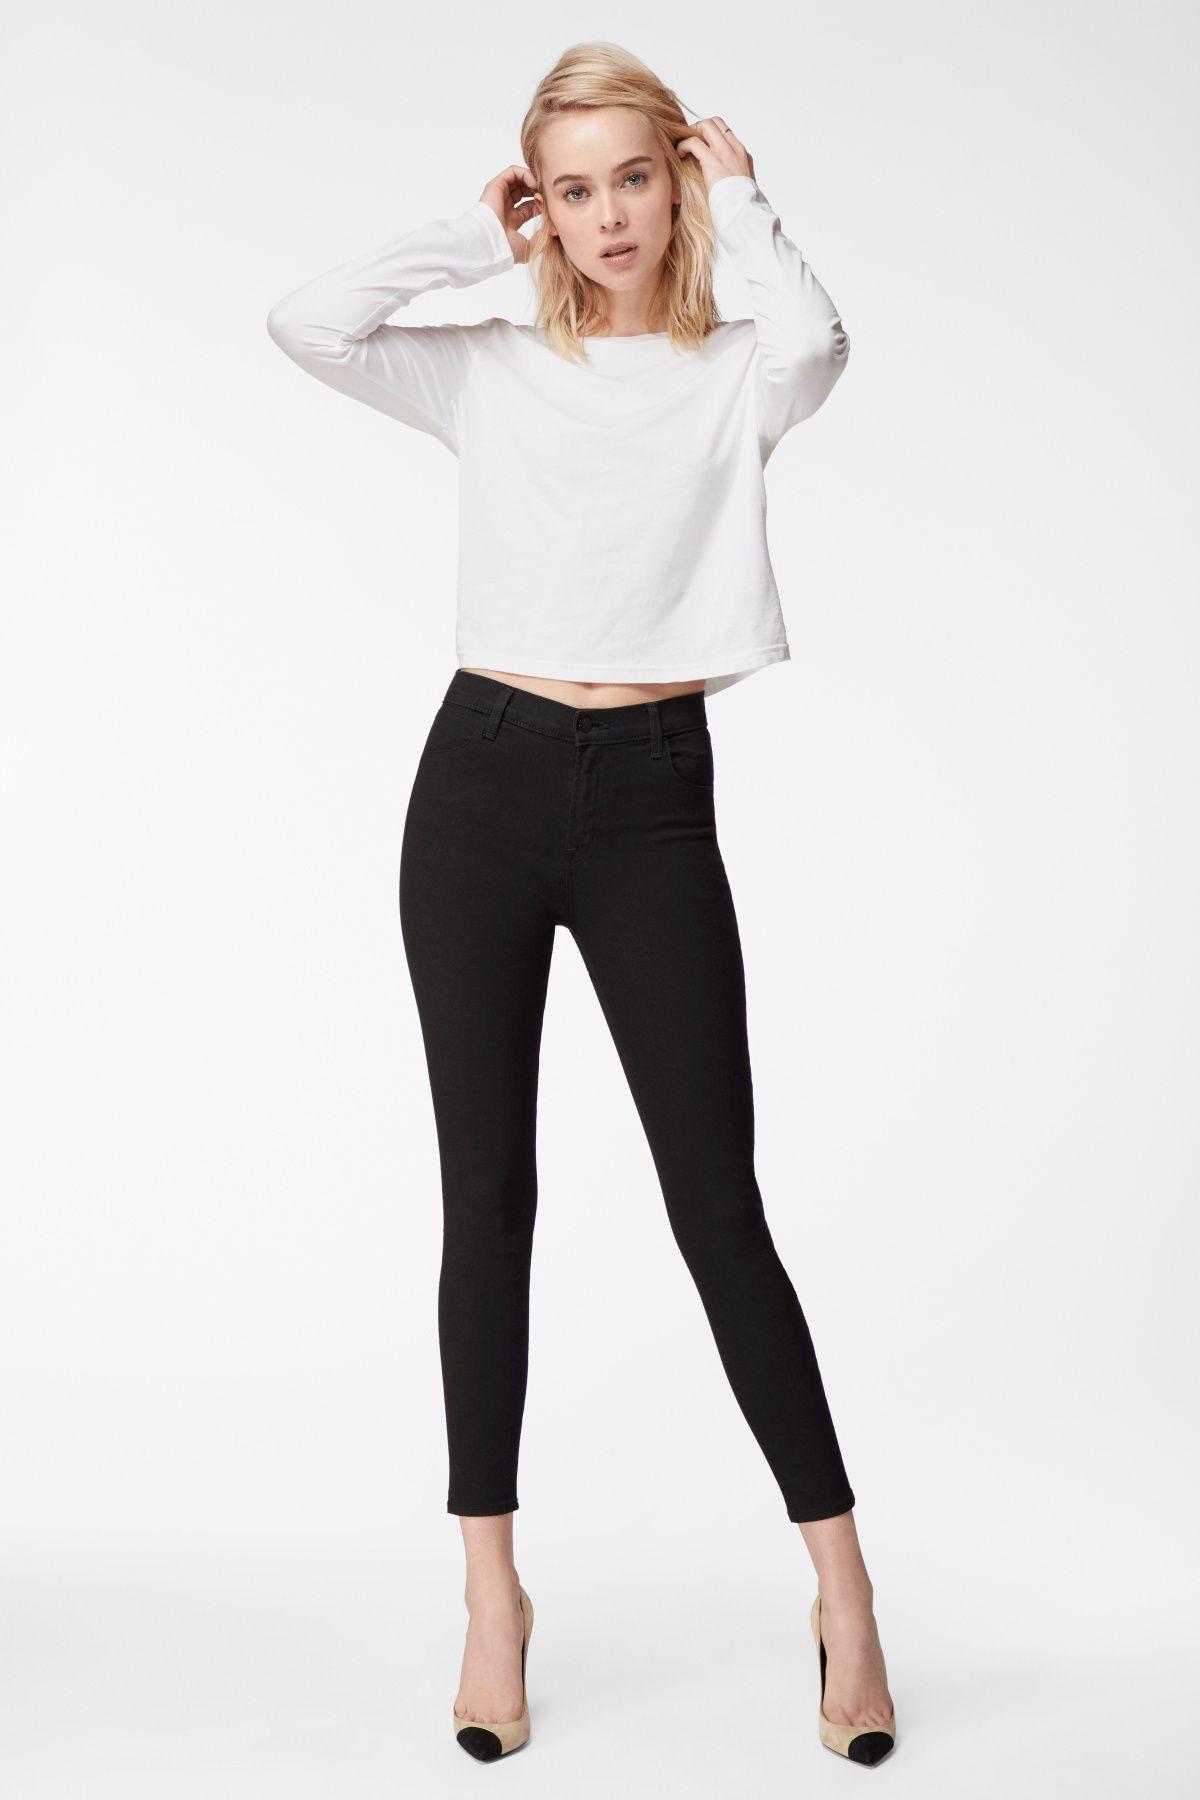 b5819e8d597 5 Body Shaping Jeans that Act Like Shapewear